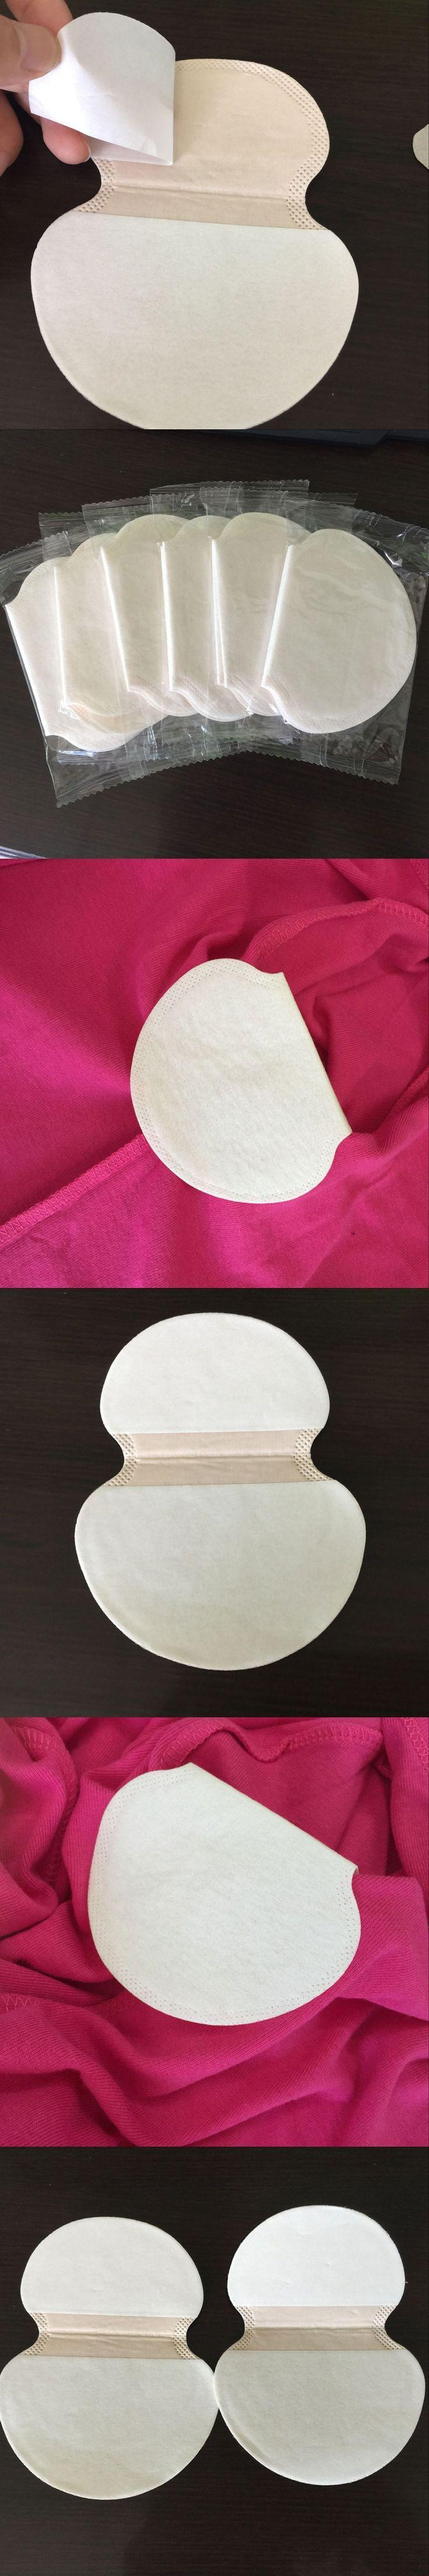 50/100Pcs Summer Deodorants Underarm Sweat Pads for Clothing Disposable Anti Sweat Stickers Armpit Shield Underarm Sweat Pads